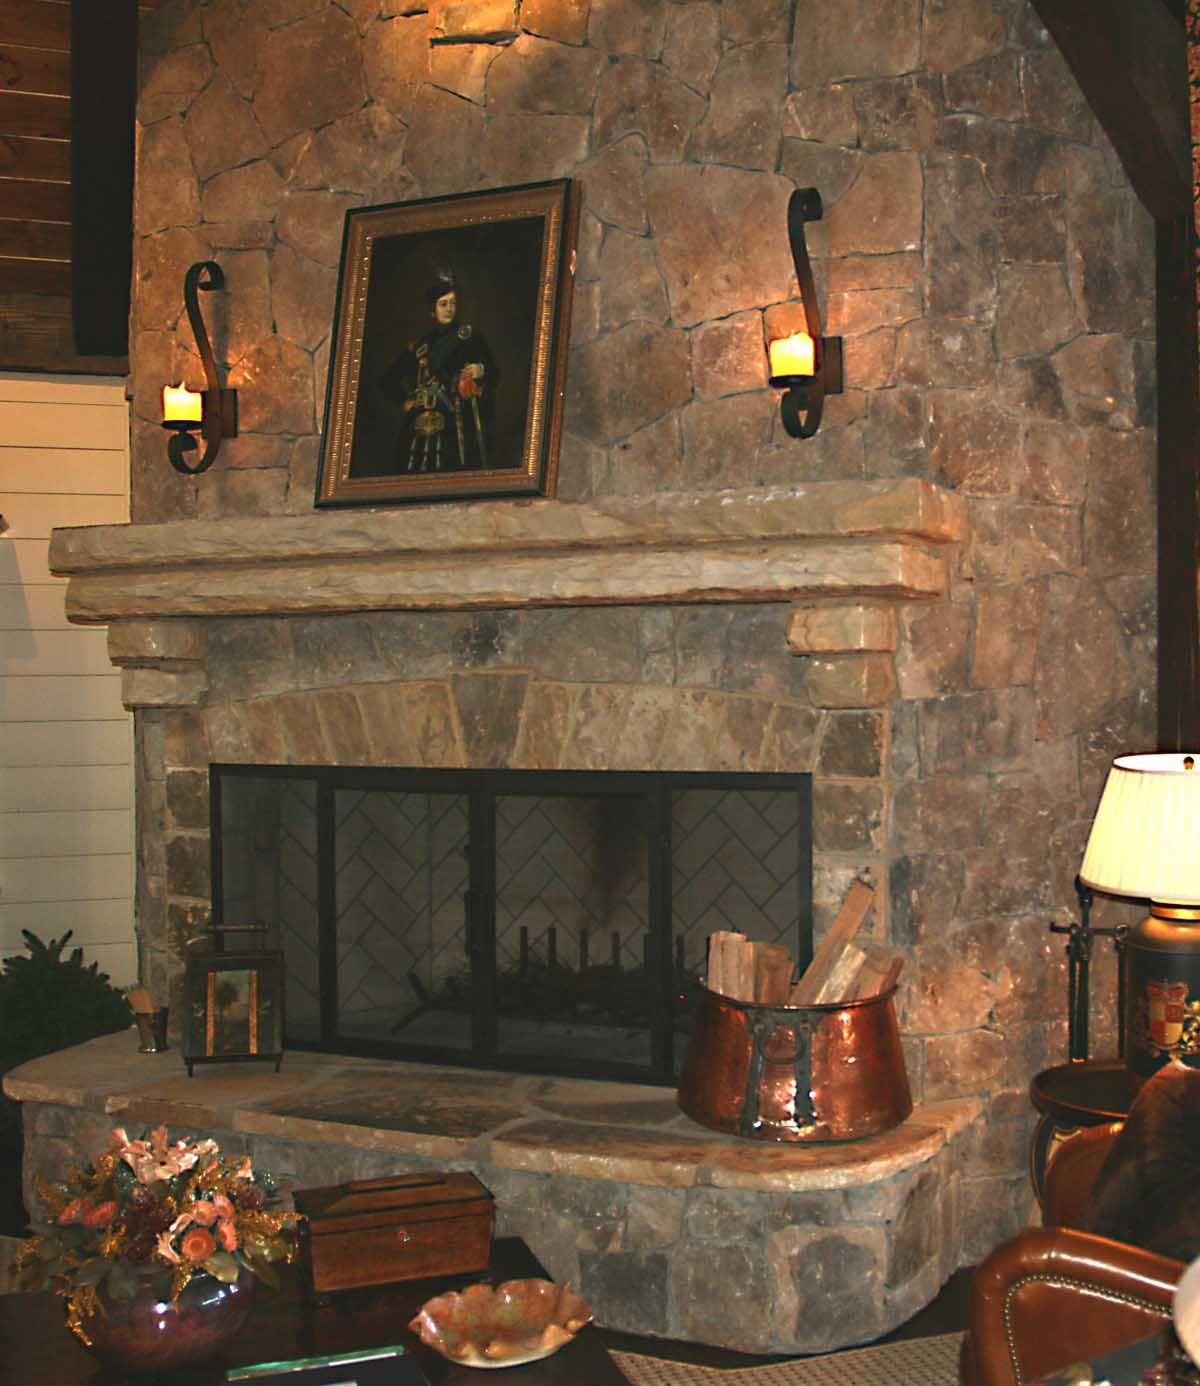 Stone fireplace hearth ideas large stone fireplace with - Fireplace hearth stone ideas ...